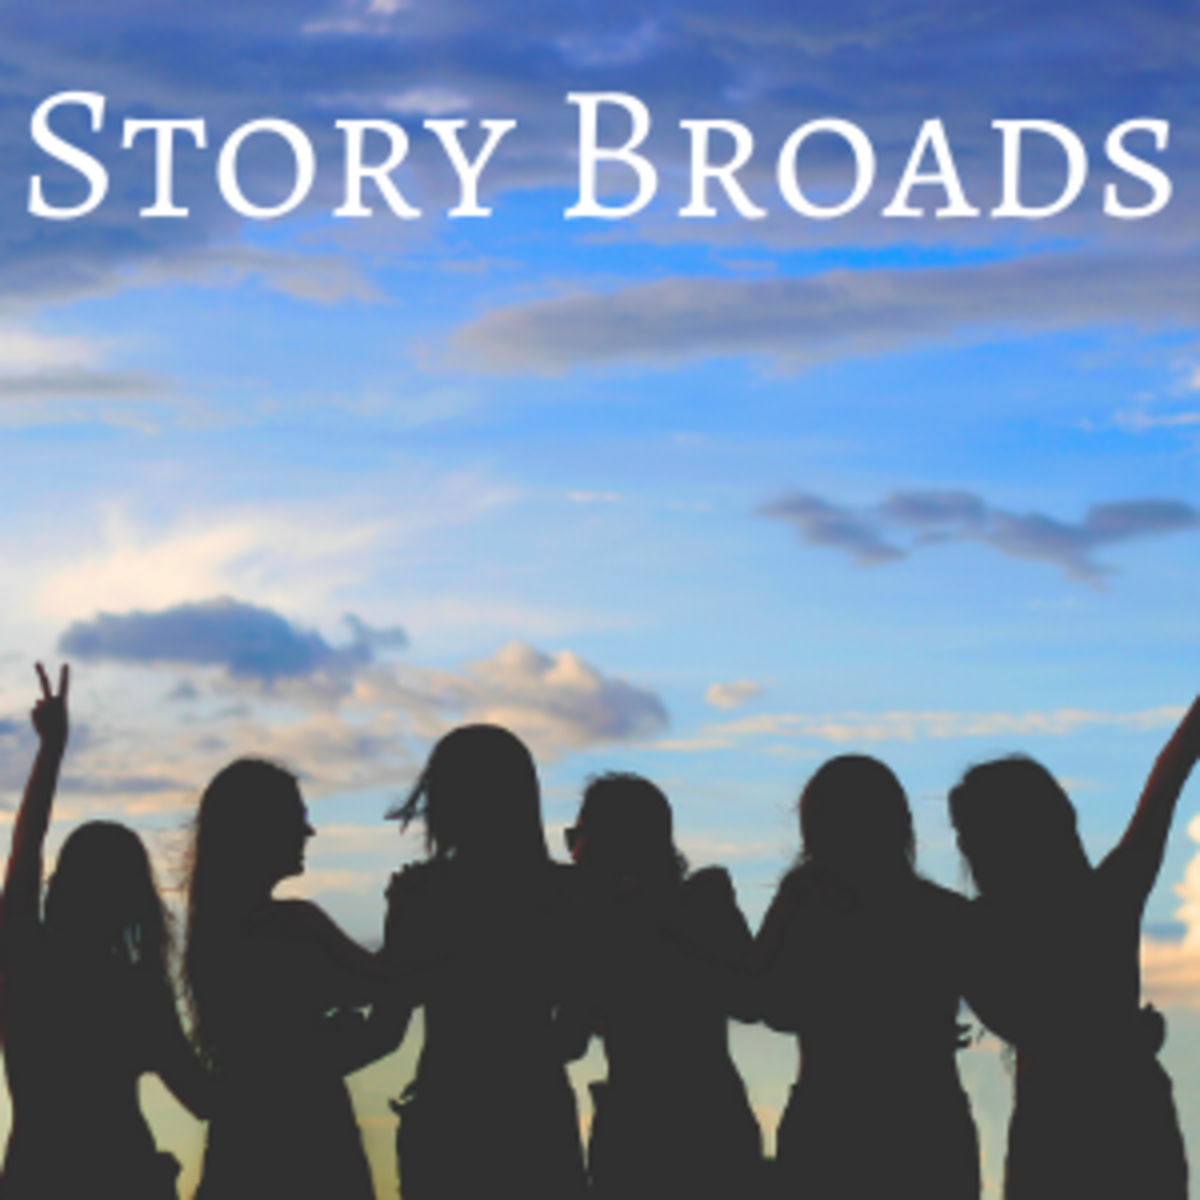 story broads 2